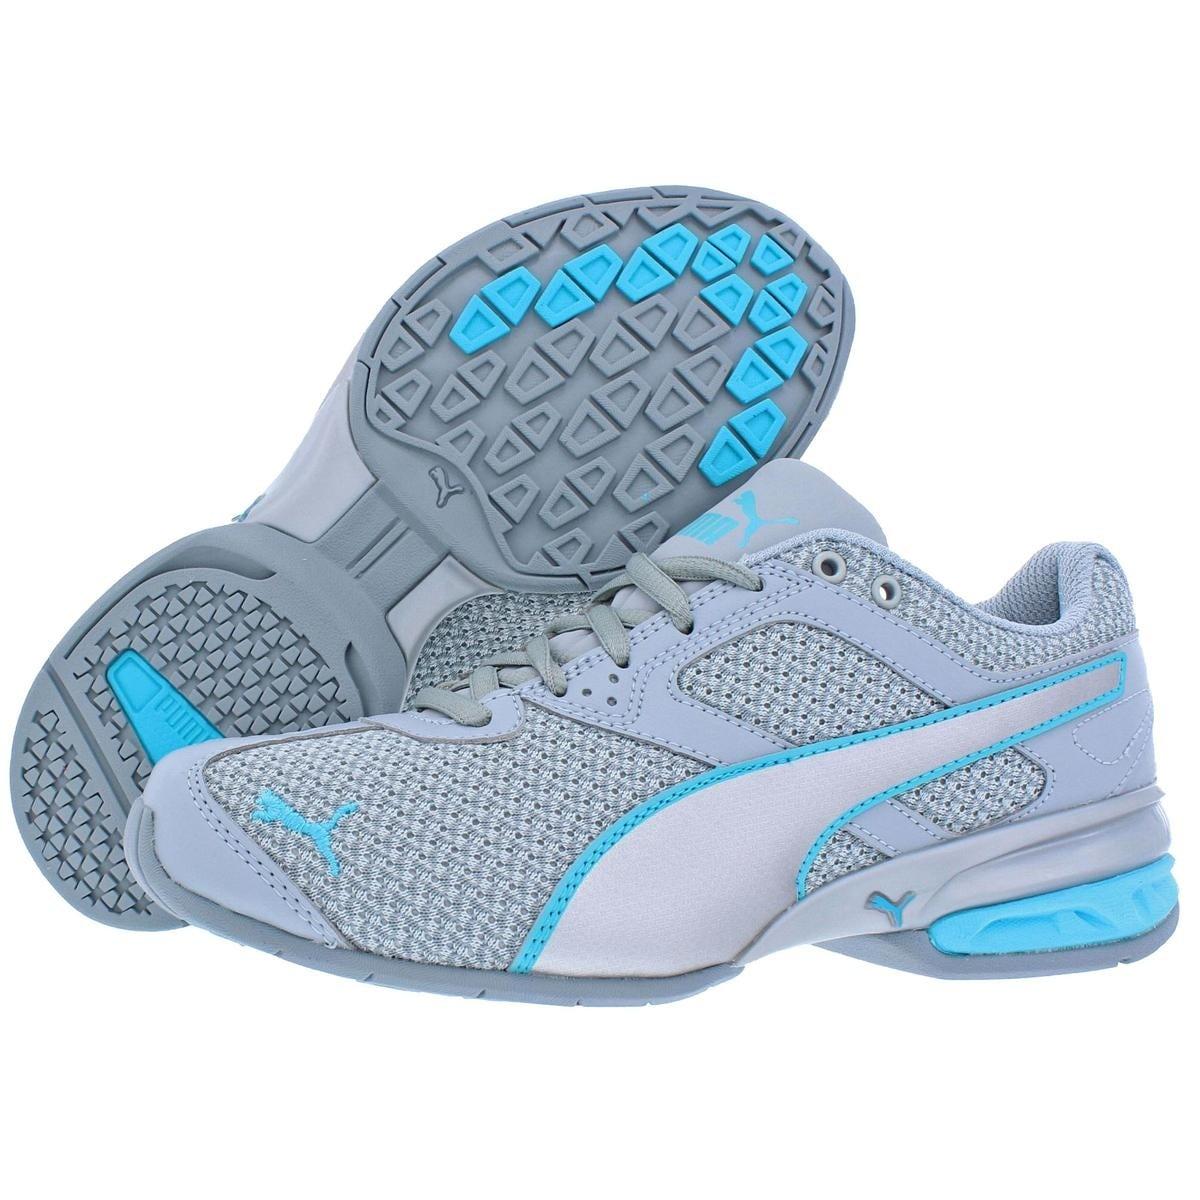 f7fc06a4d17 Shop Puma Womens Tazon 6 Knit Running Shoes Soft Foam Metallic - Ships To  Canada - Overstock - 22727145